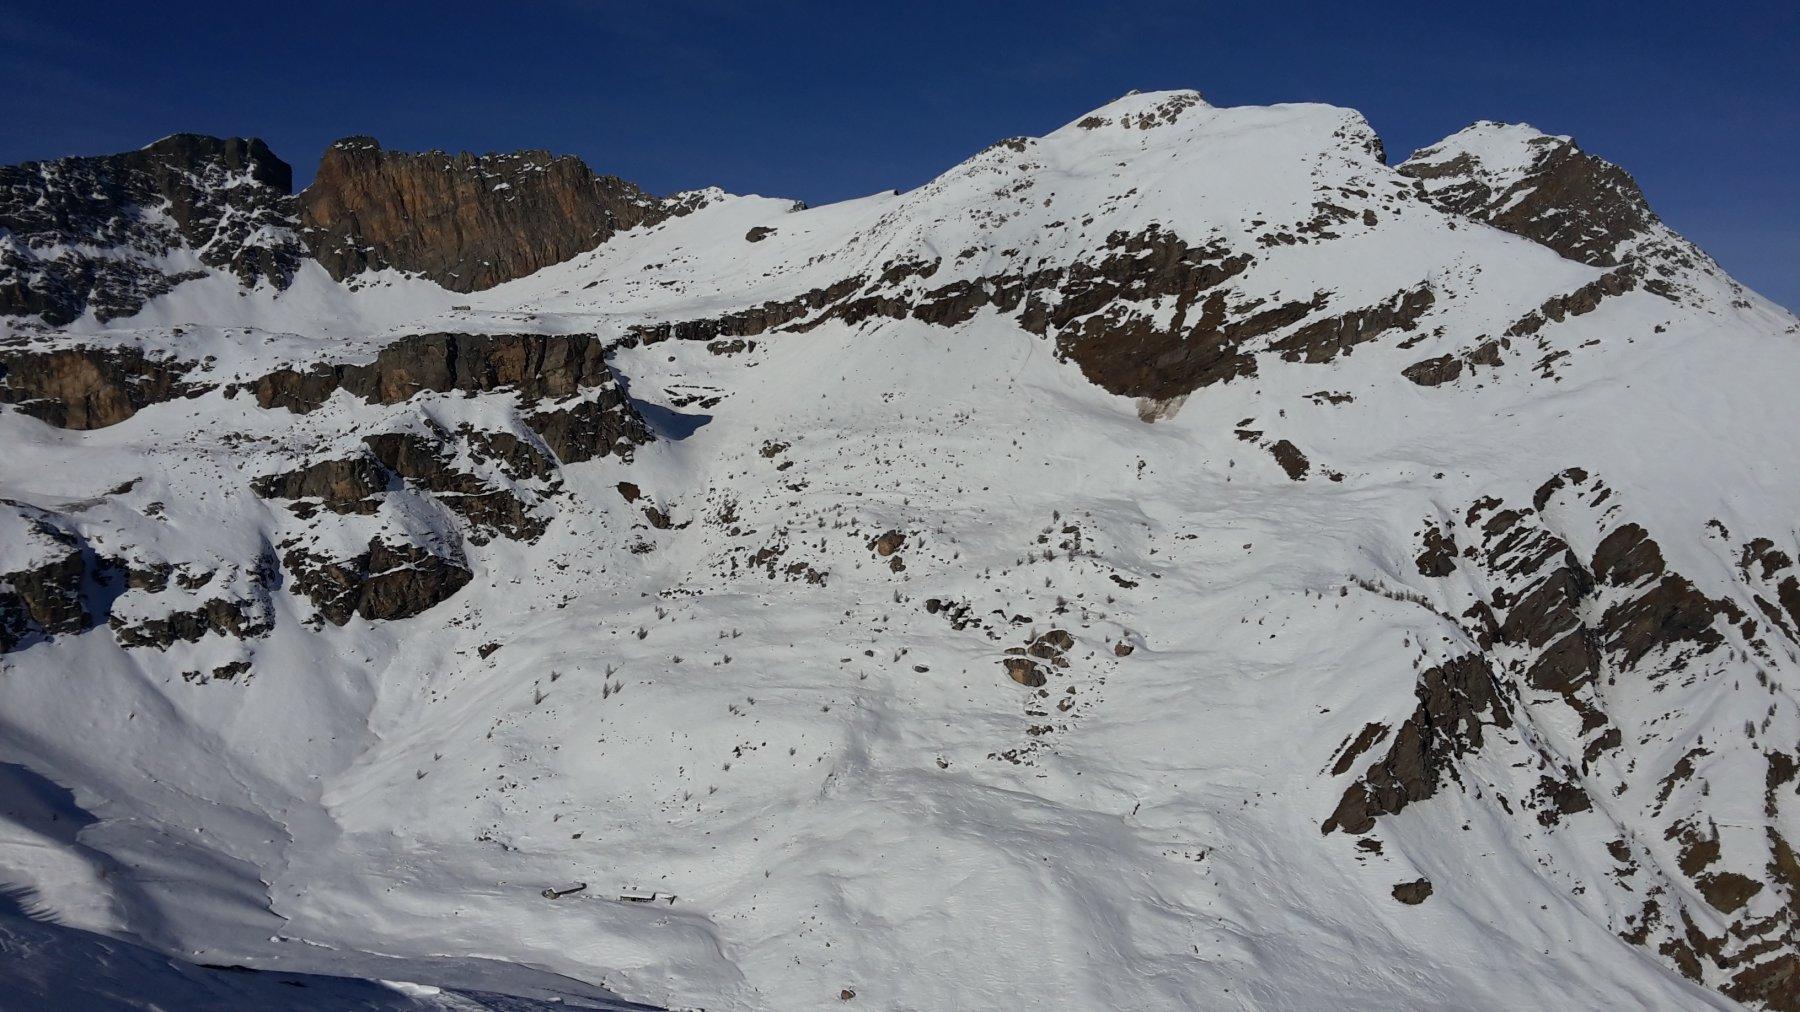 Sagneres, Rocca Gialeo e Monte Camoscere